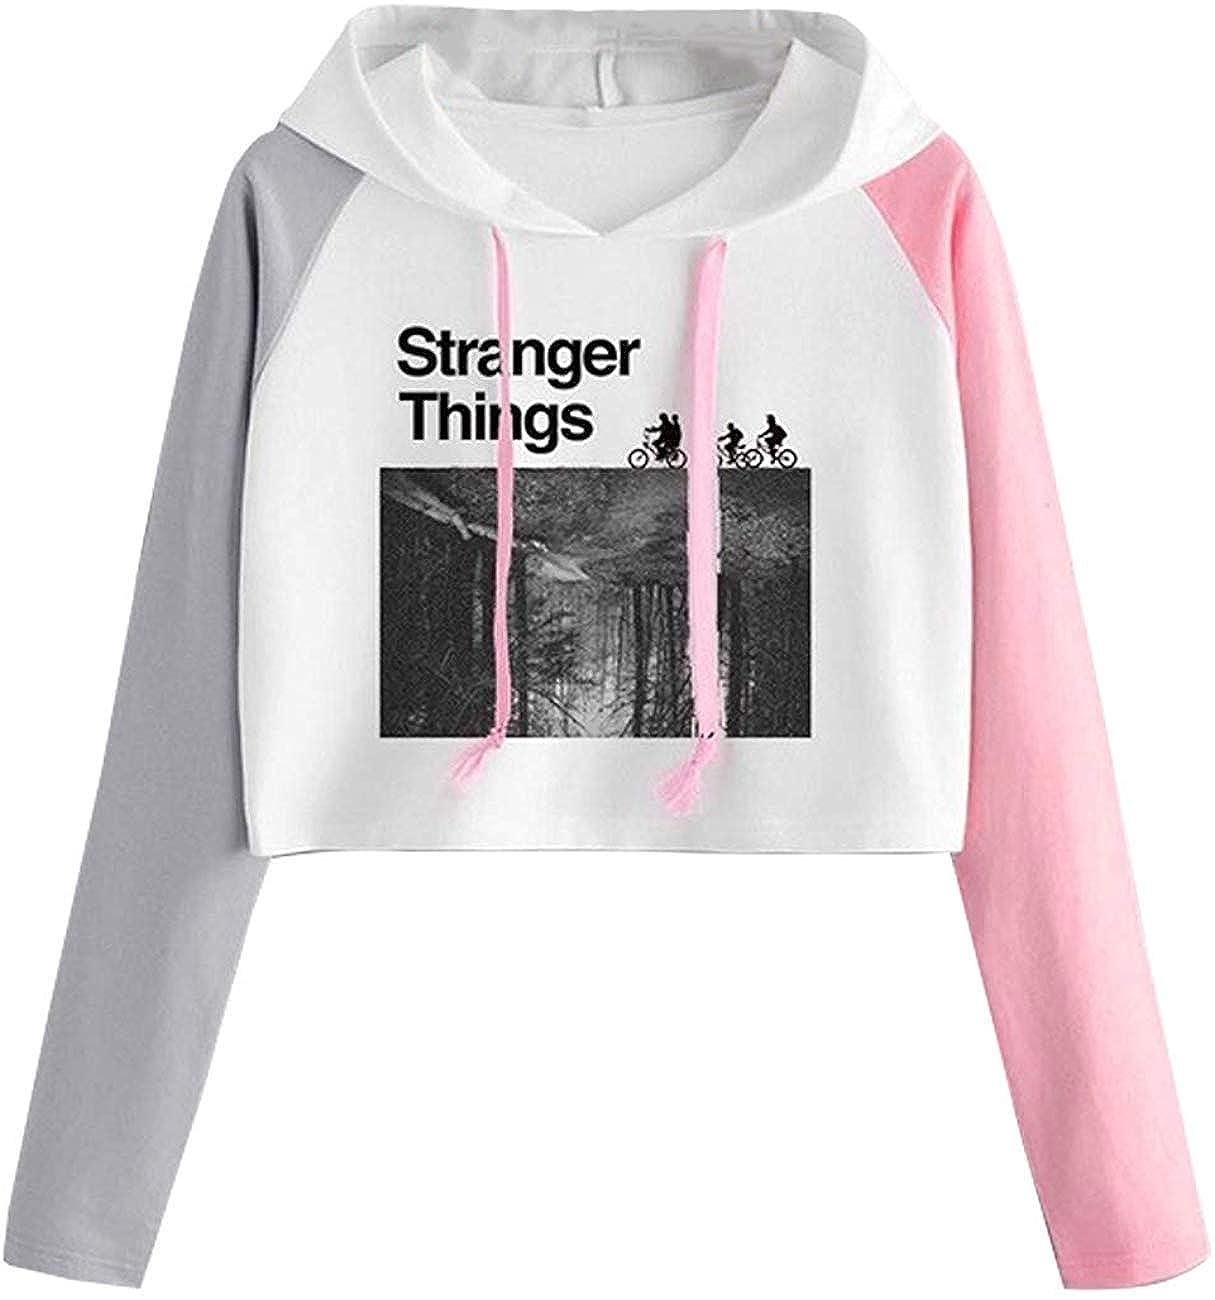 Sudadera Stranger Things 3 Mujer Corta T-Shirt Camisetas de Manga Larga con Capucha Chicas Impresi/ón Cortita Deportivo Casual Sweatshirt Sudadera Stranger Things Ni/ña